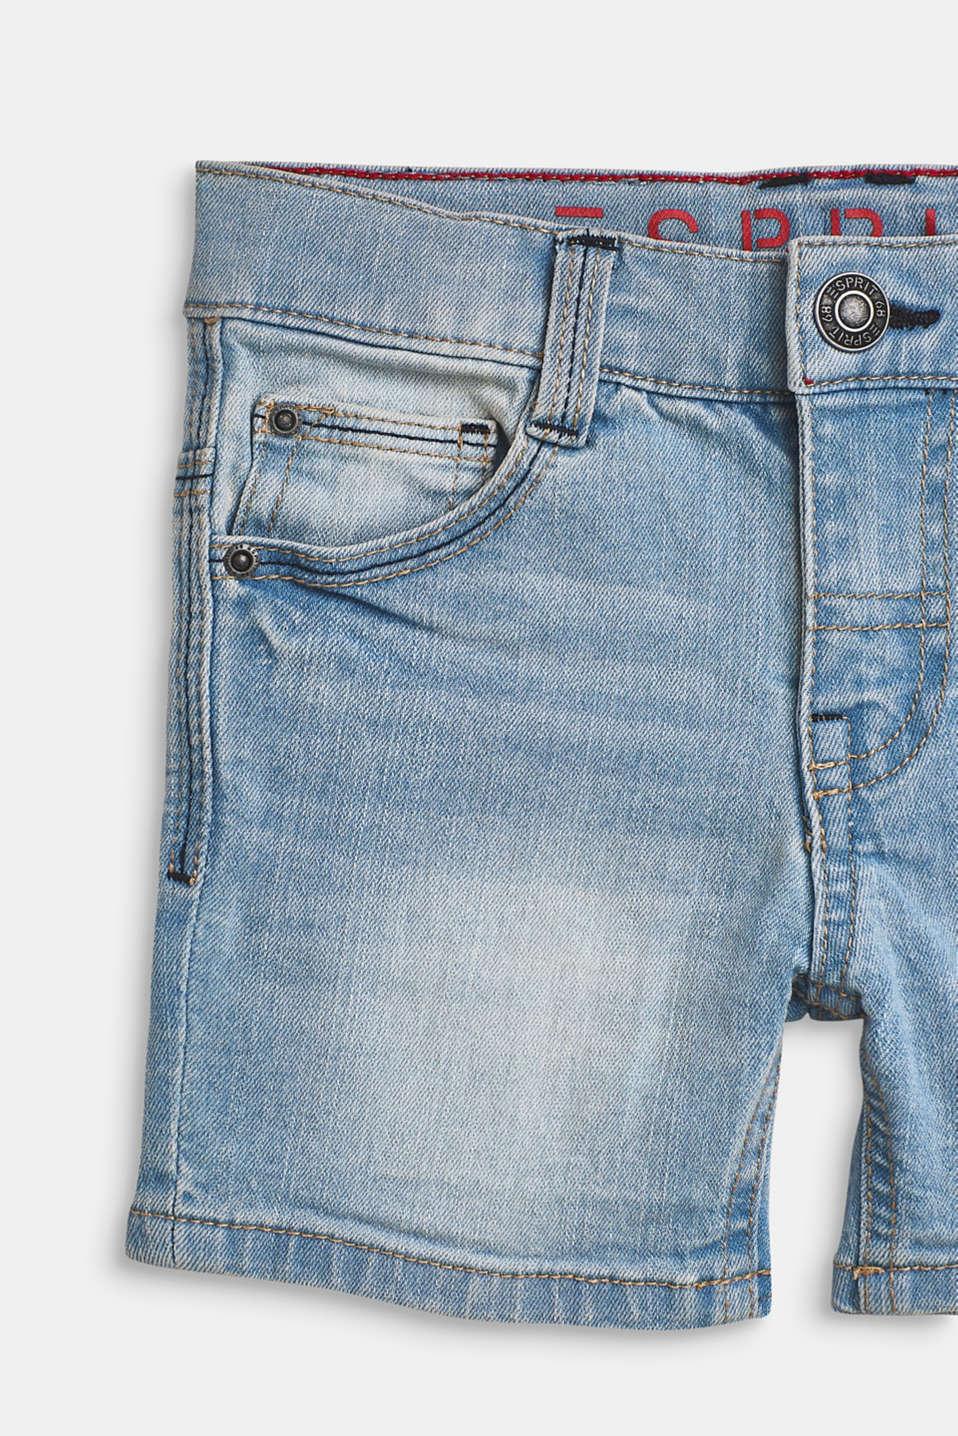 Ultra stretchy denim shorts with a vintage garment wash, BLUE LIGHT WAS, detail image number 2